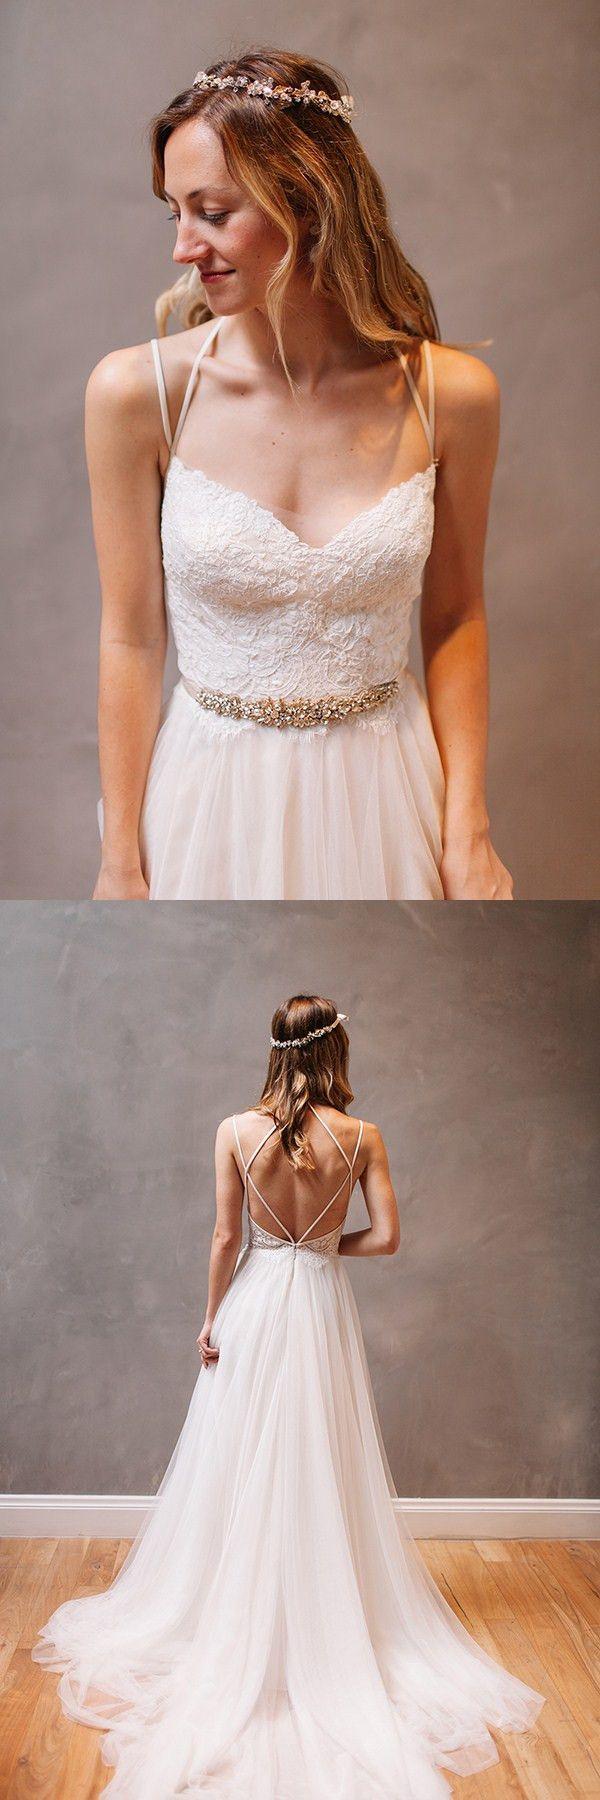 wedding dresses,sleeveless wedding dresses,tulle wedding dresses,cheap open back wedding dresses